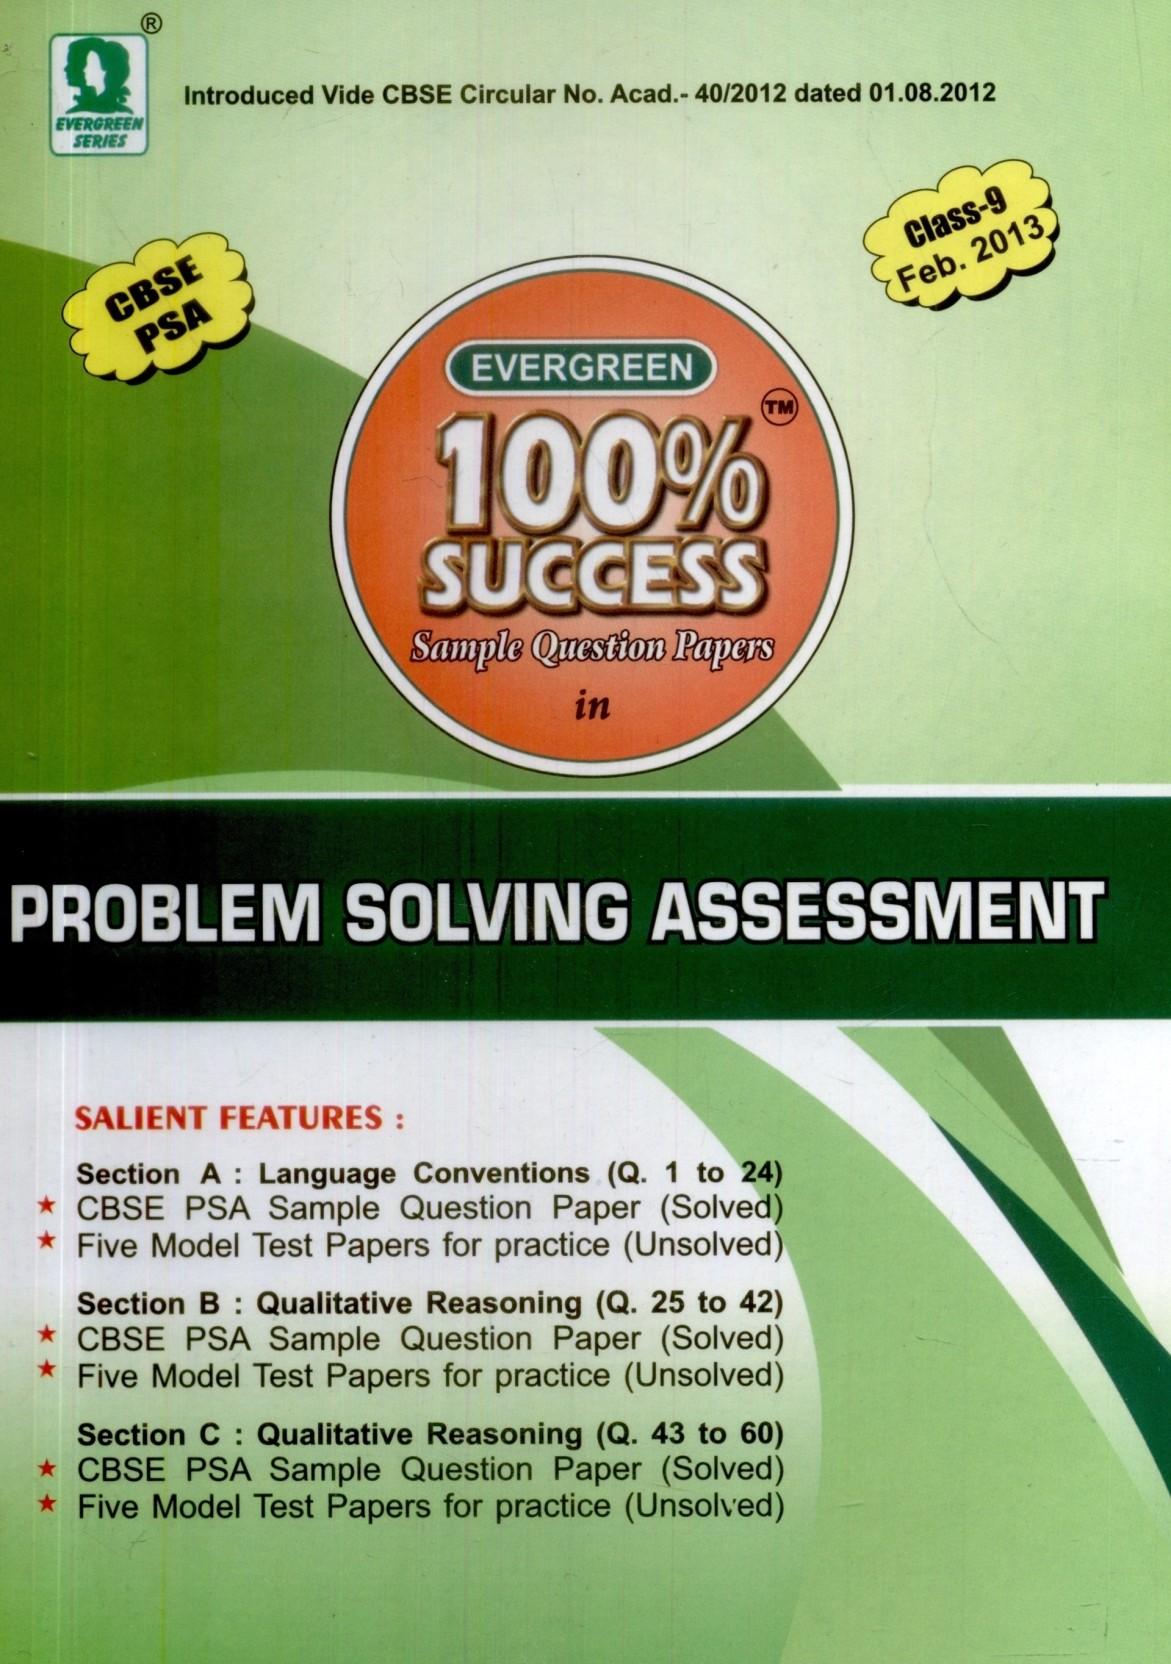 Cbse golden sample papers psa (problem solving assessment) class.